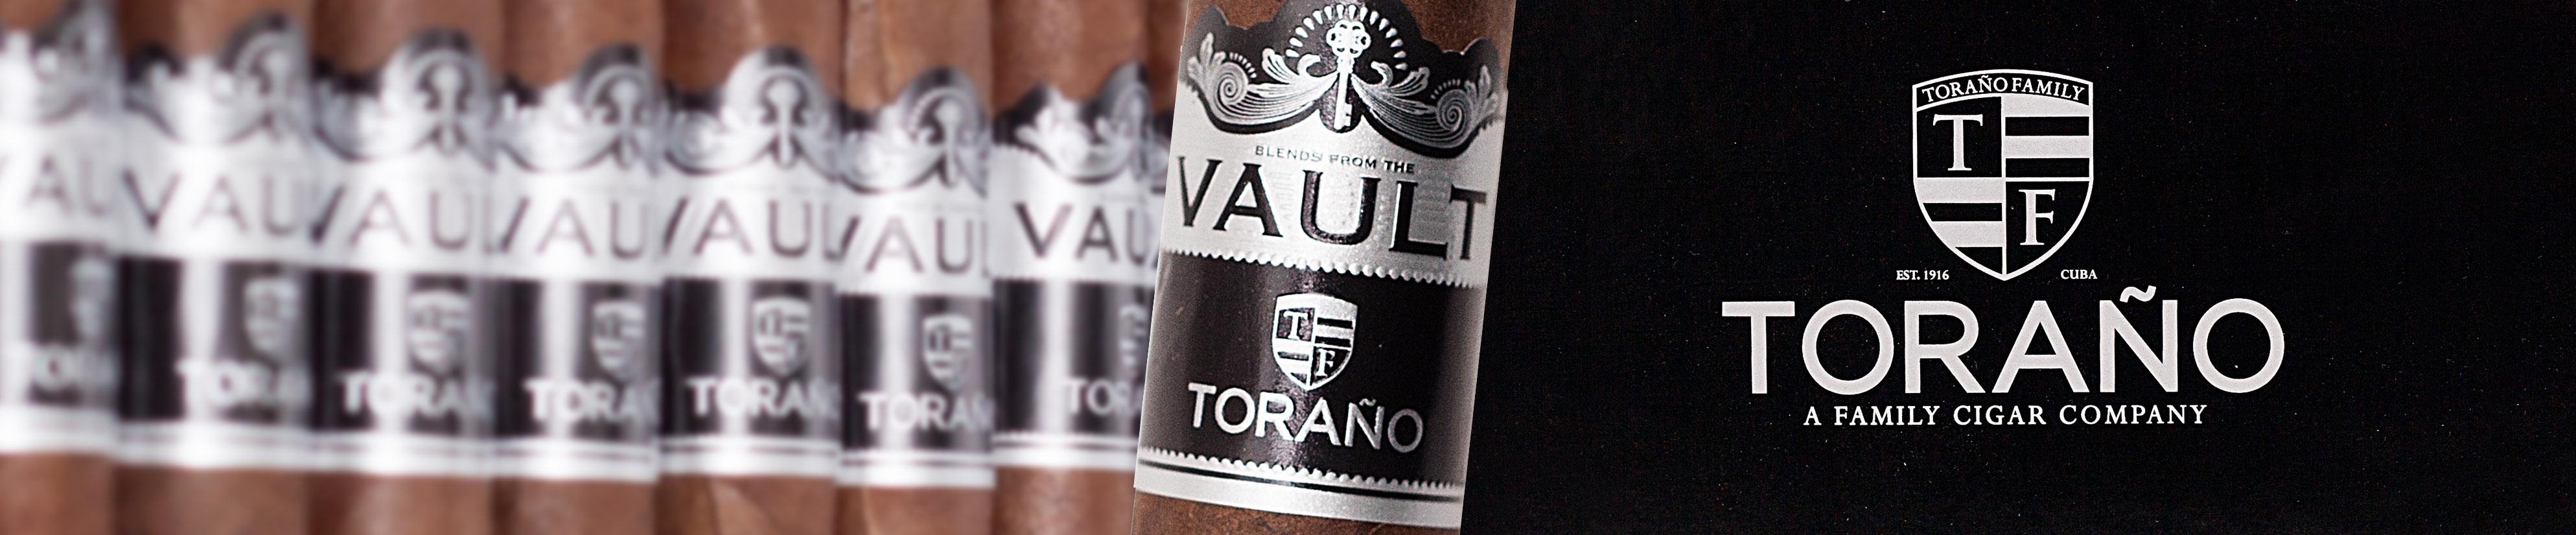 Torano Vault